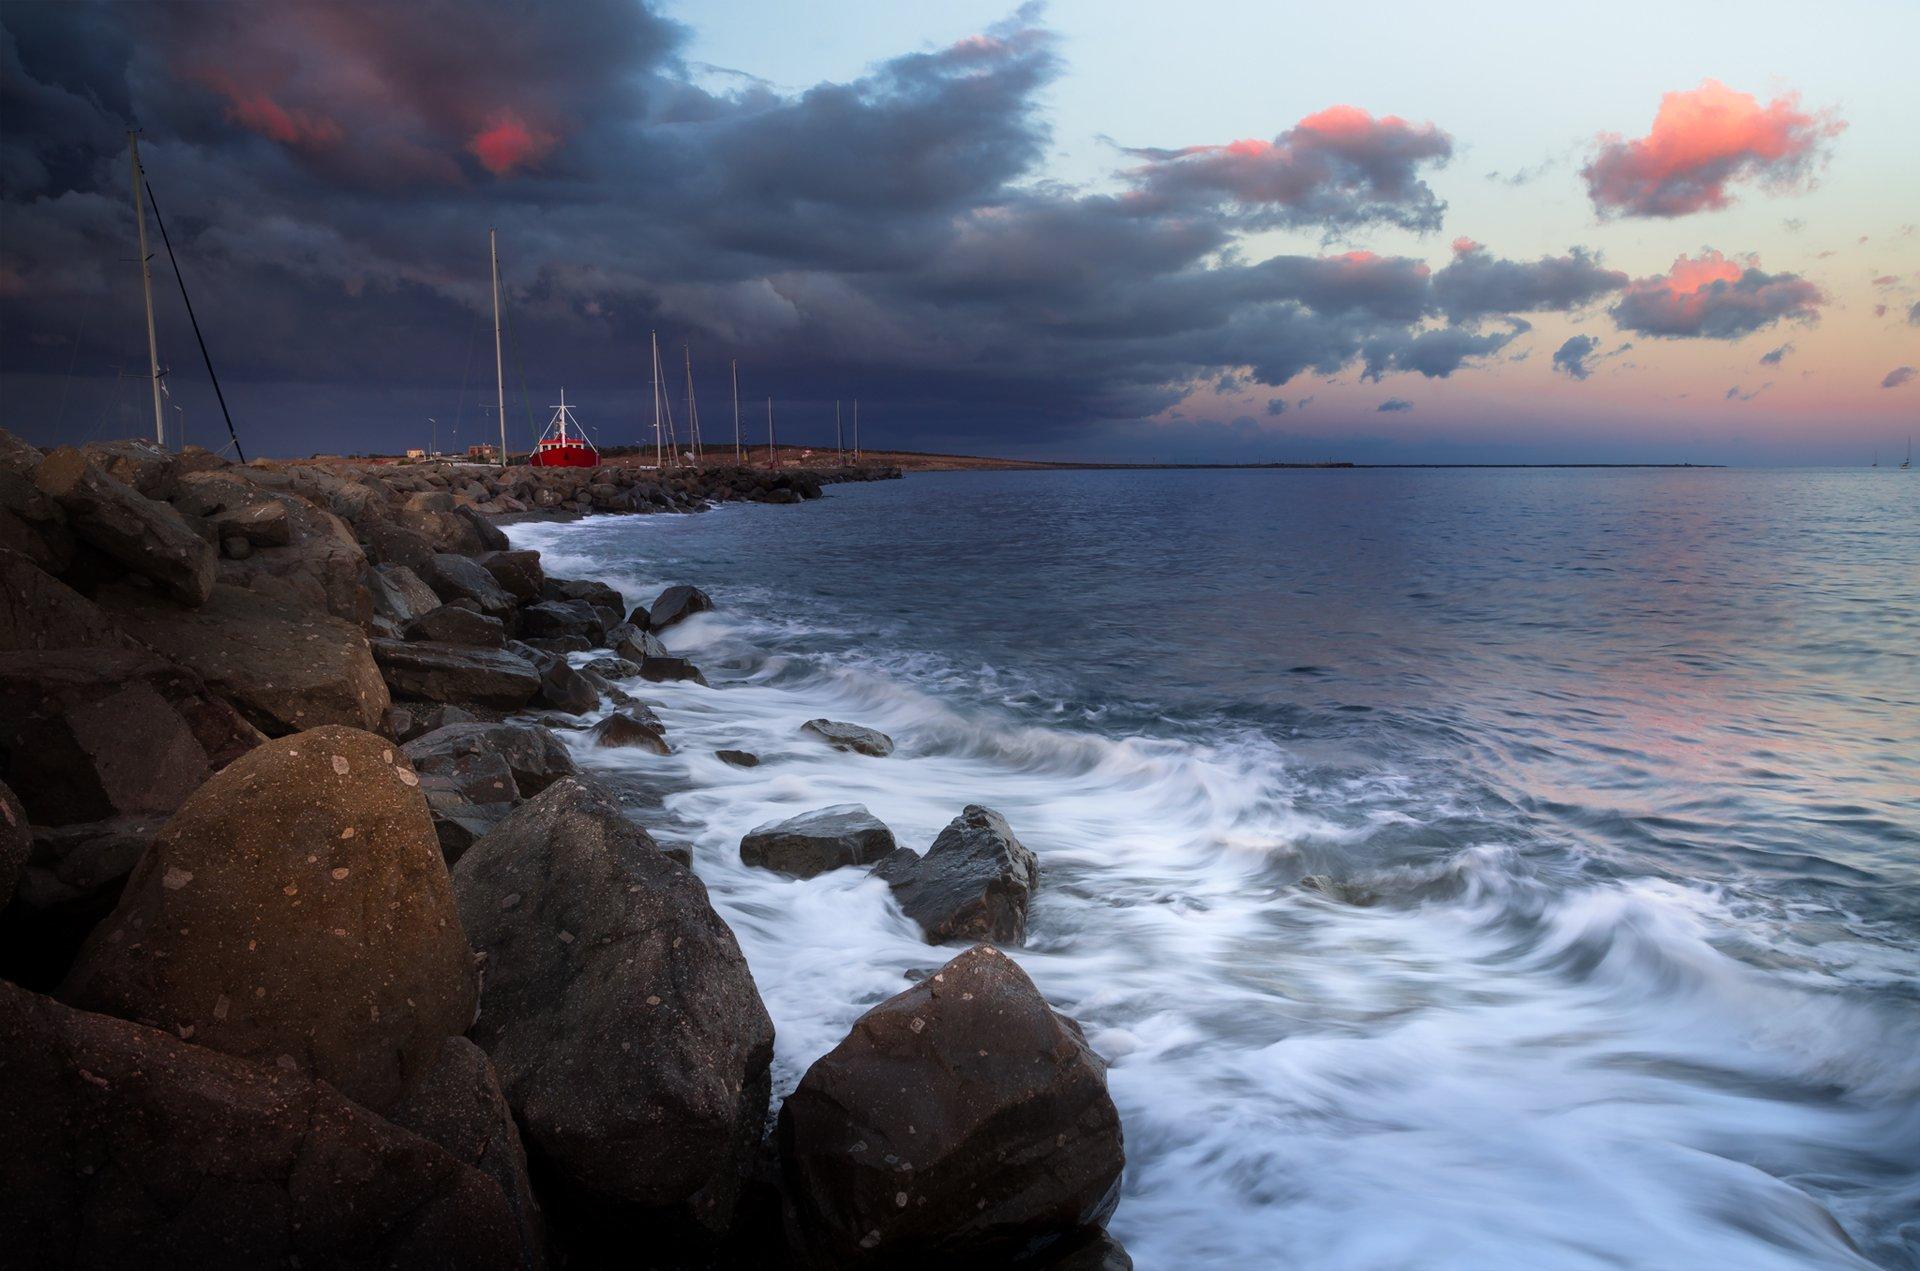 landscape, nature, seascape, sunrise, rocks, castal, coast, beach, sea, seaside, scenery, samothraki, greece, Александър Александров